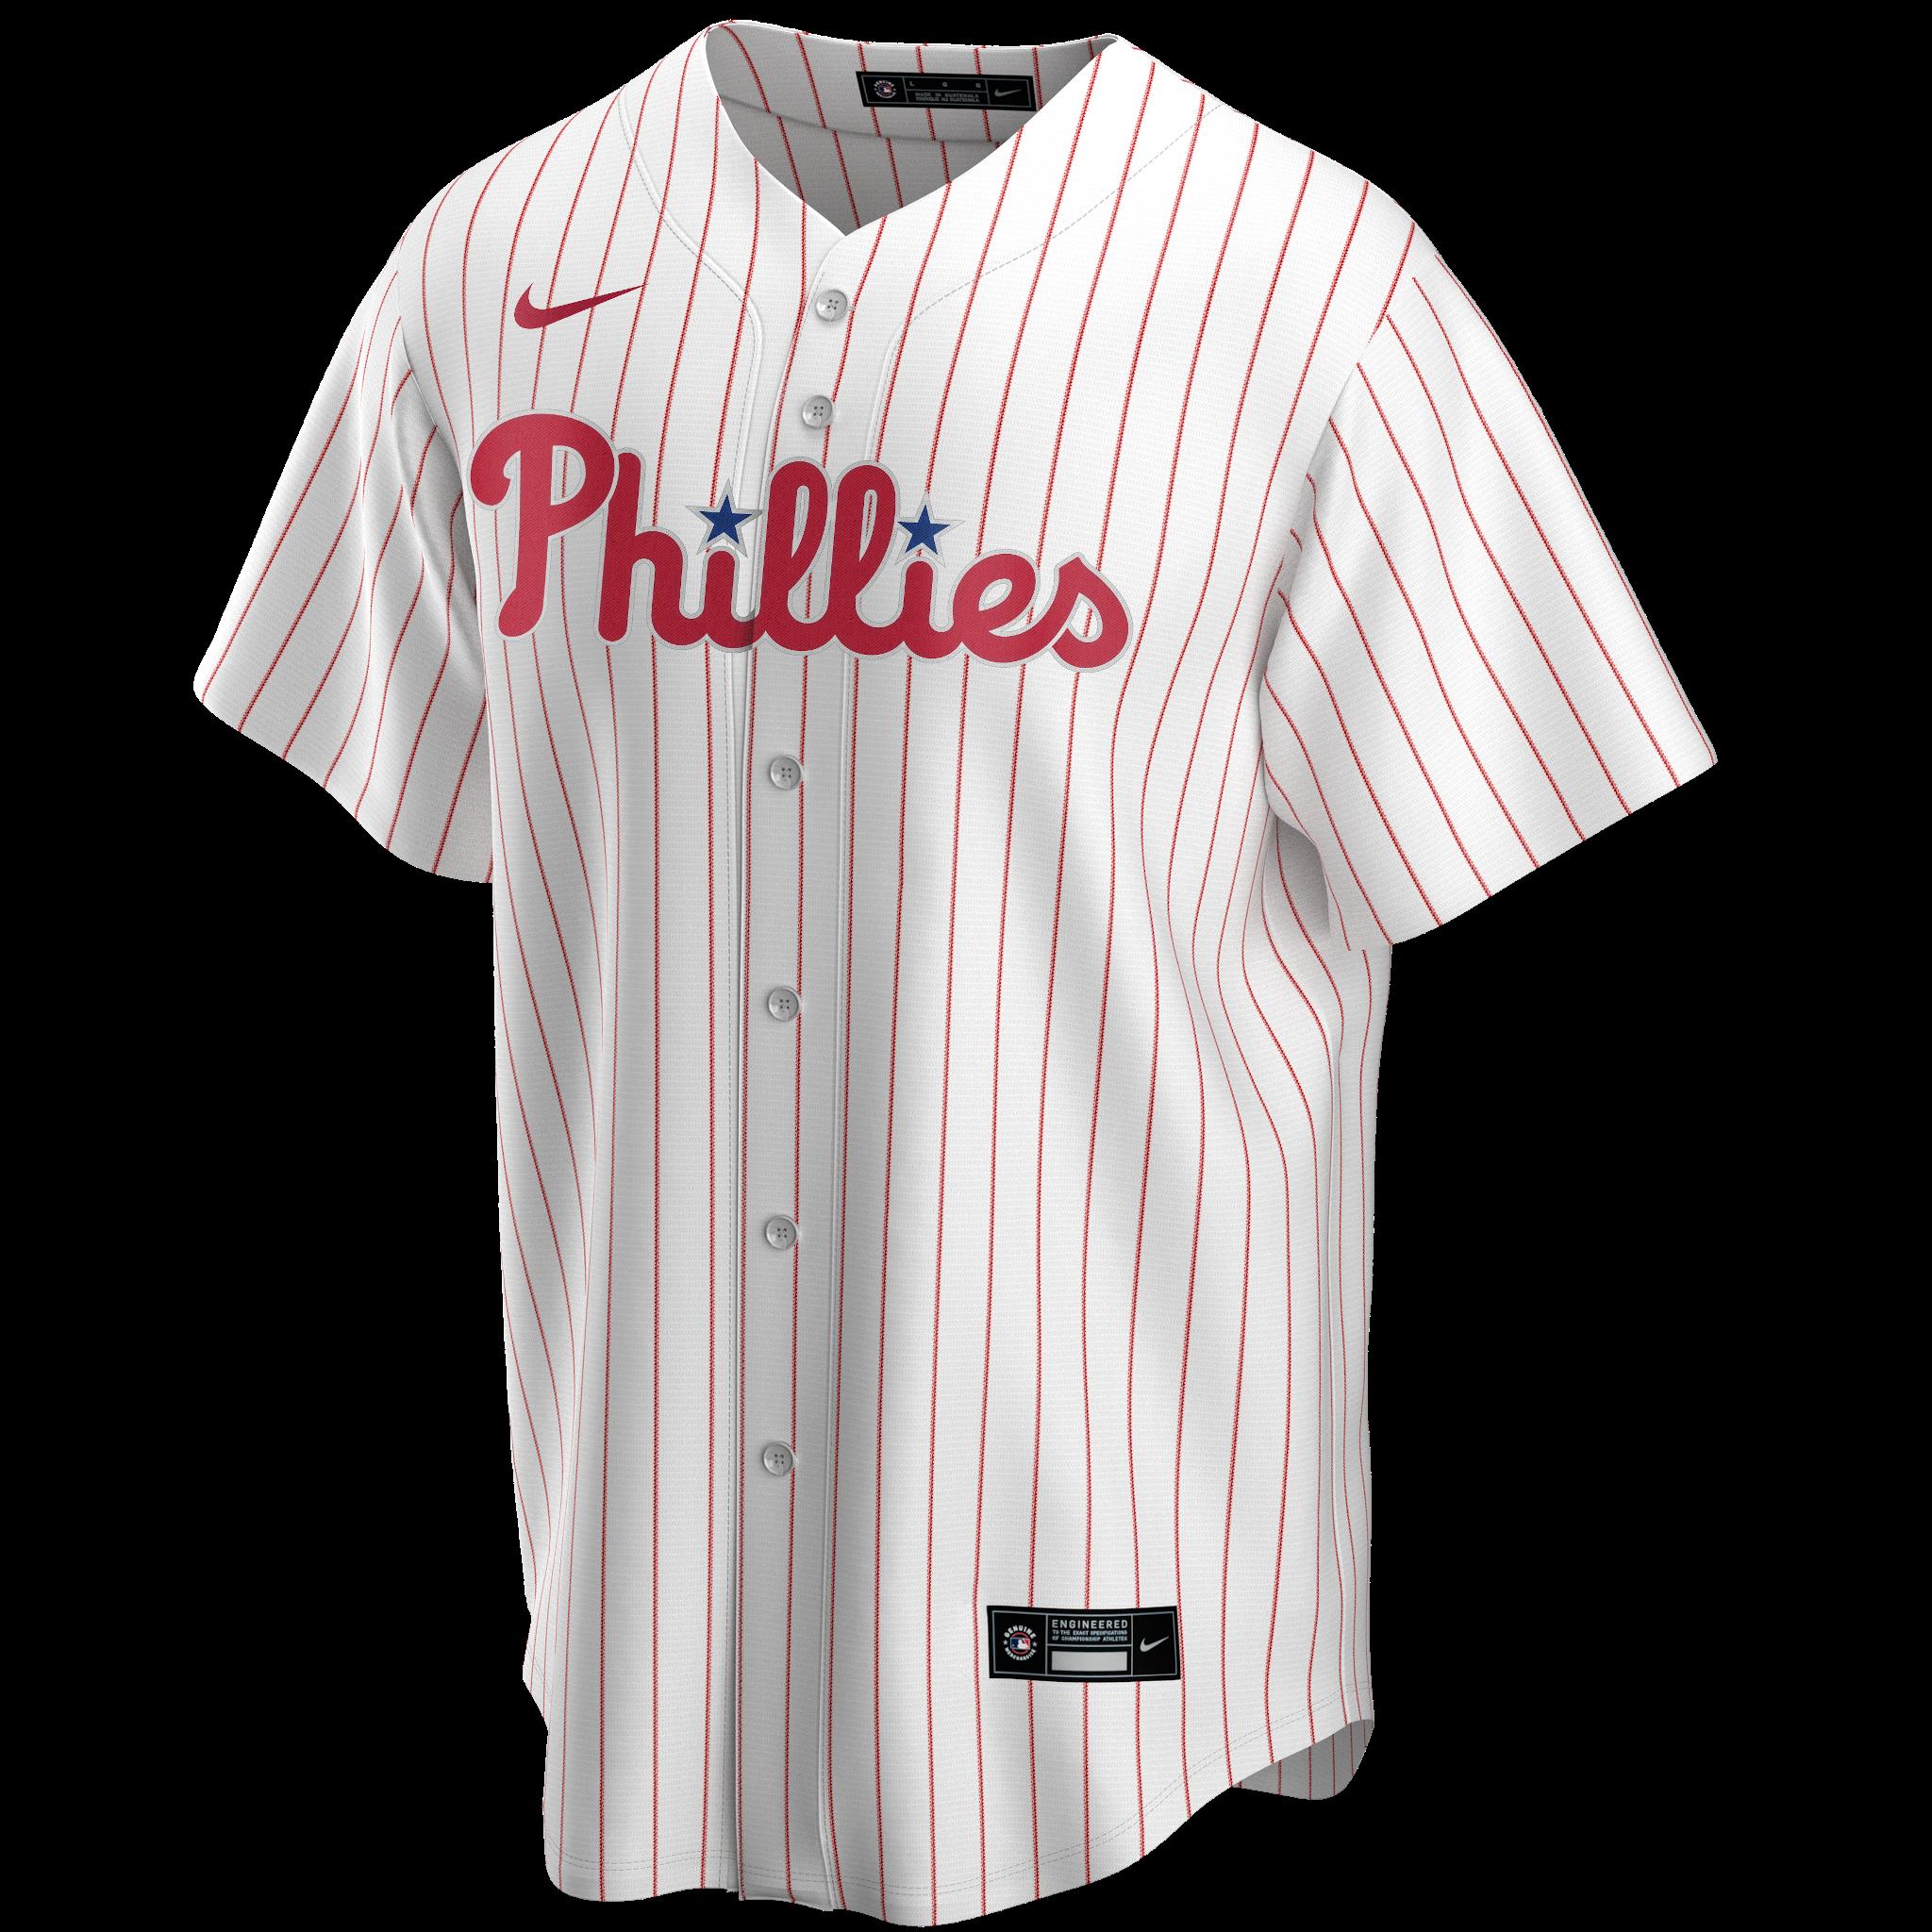 Aaron Nola Philadelphia Phillies New Arrivals Legend Baseball Player Jersey